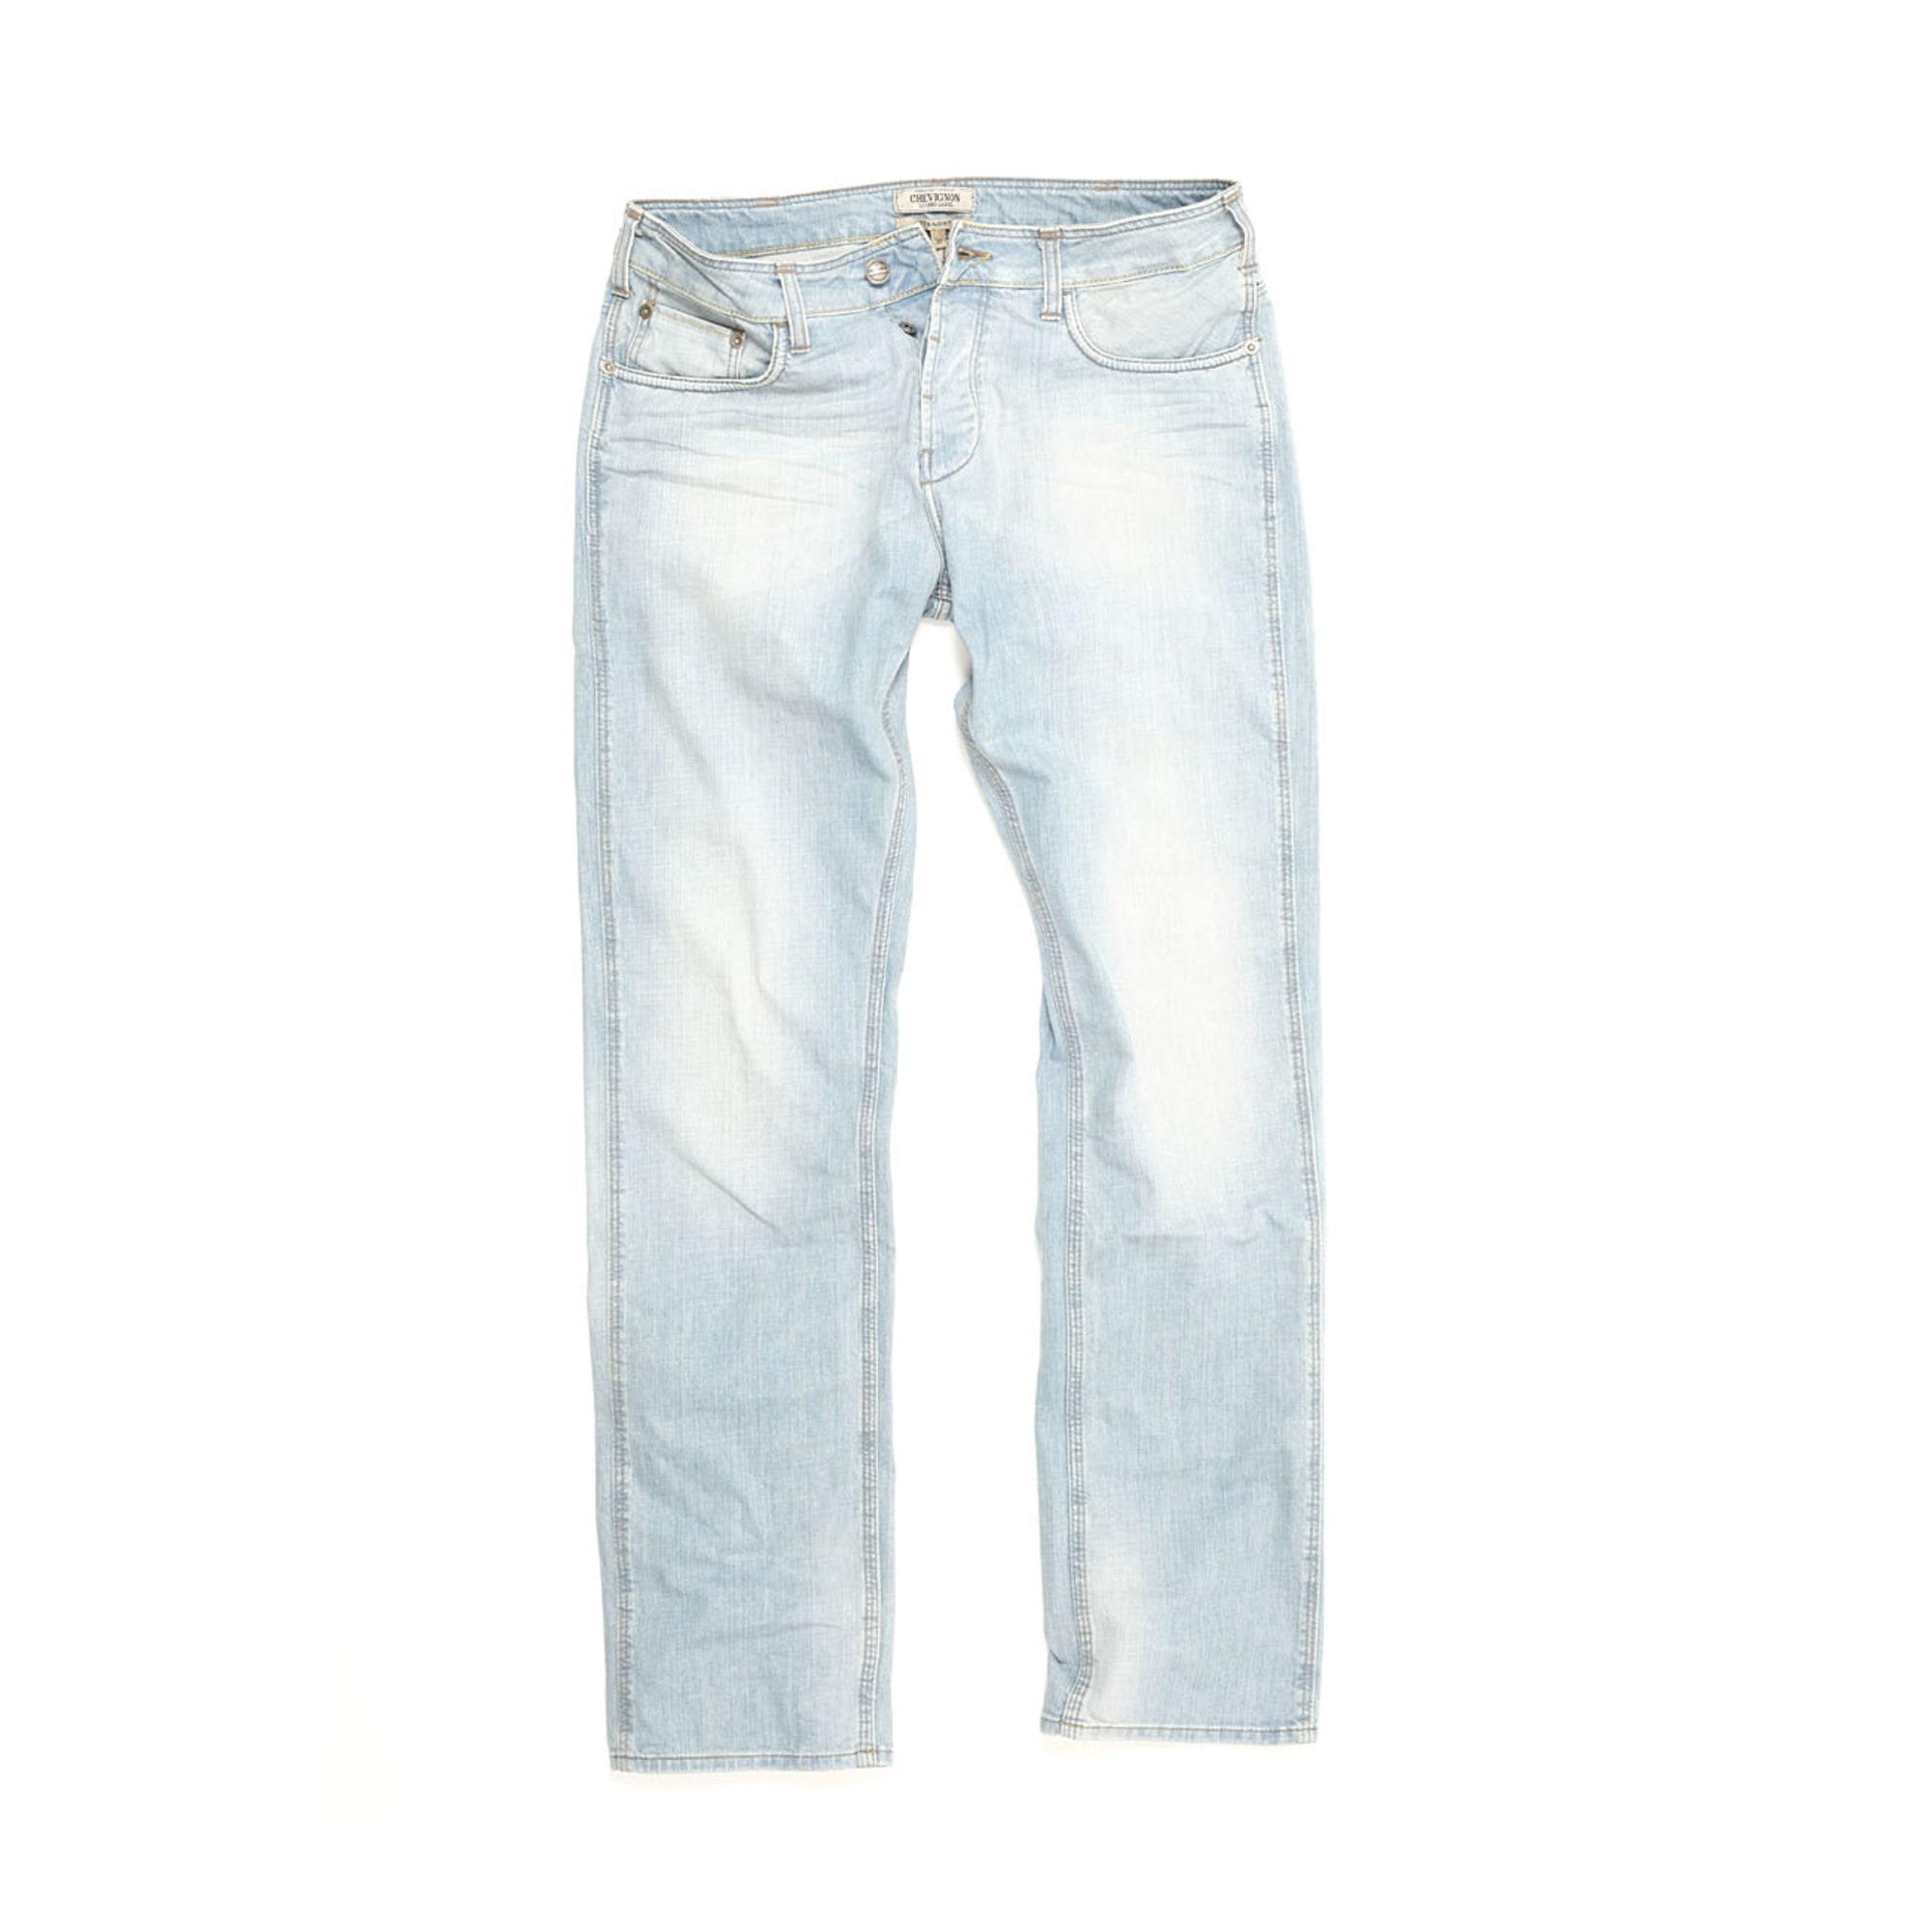 Leg Chevignon W32 42 Straight Bleach 7099823 Jeans Wpppvxhano T vqq6dtwEn